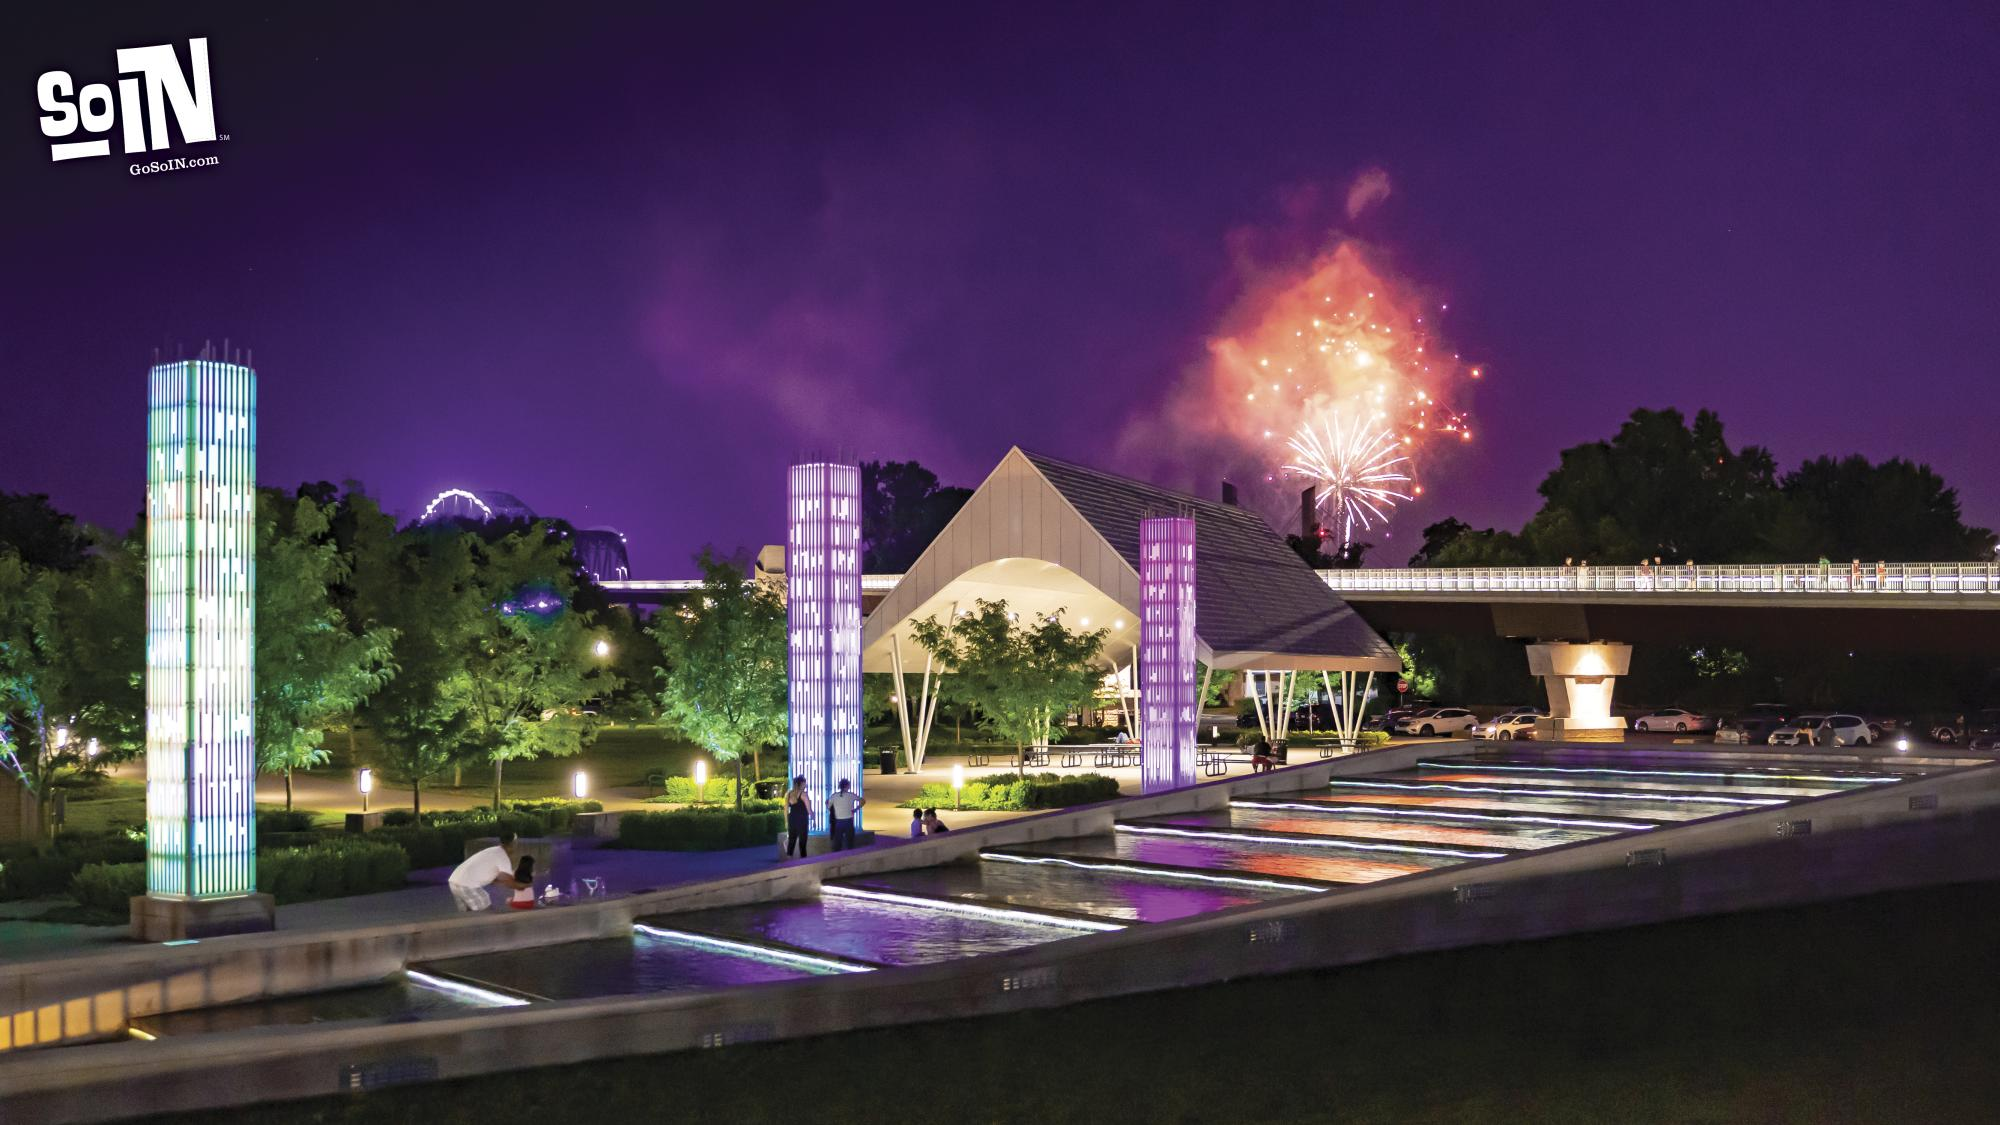 SoIN Virtual Background 4 - Big Four Station Park